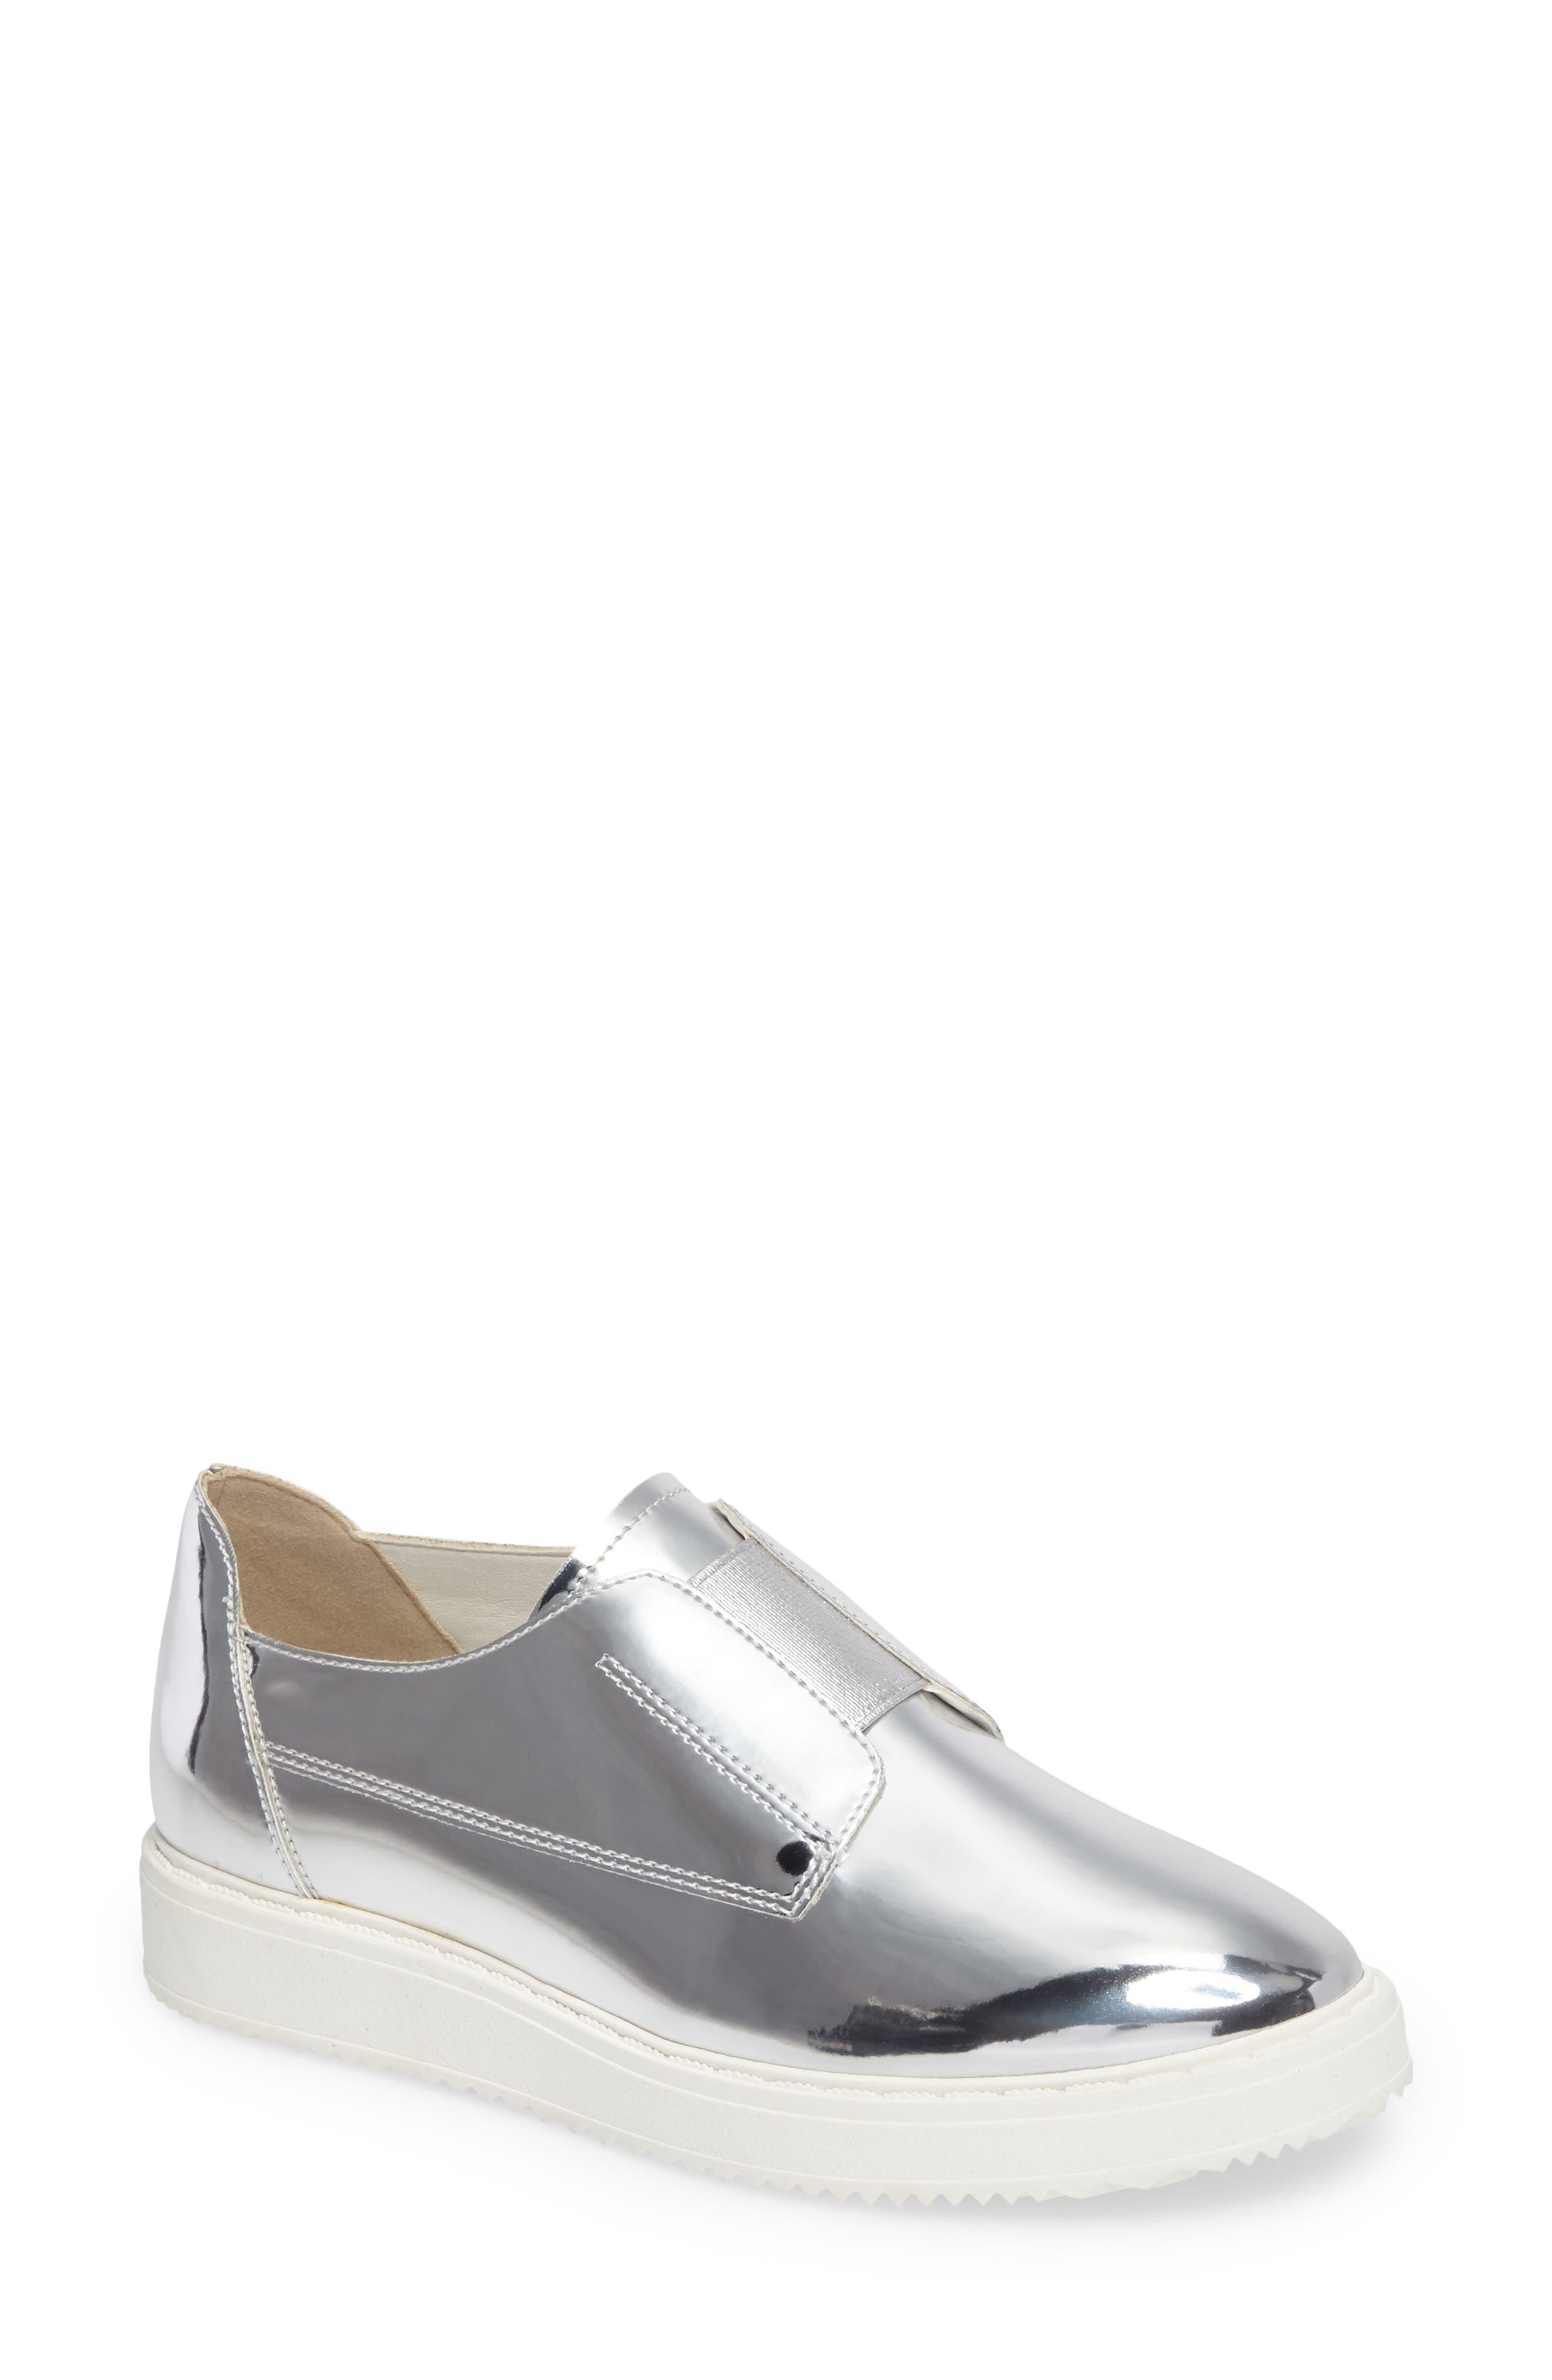 Trist Slip-On Metallic Sneaker,                         Main,                         color, 045